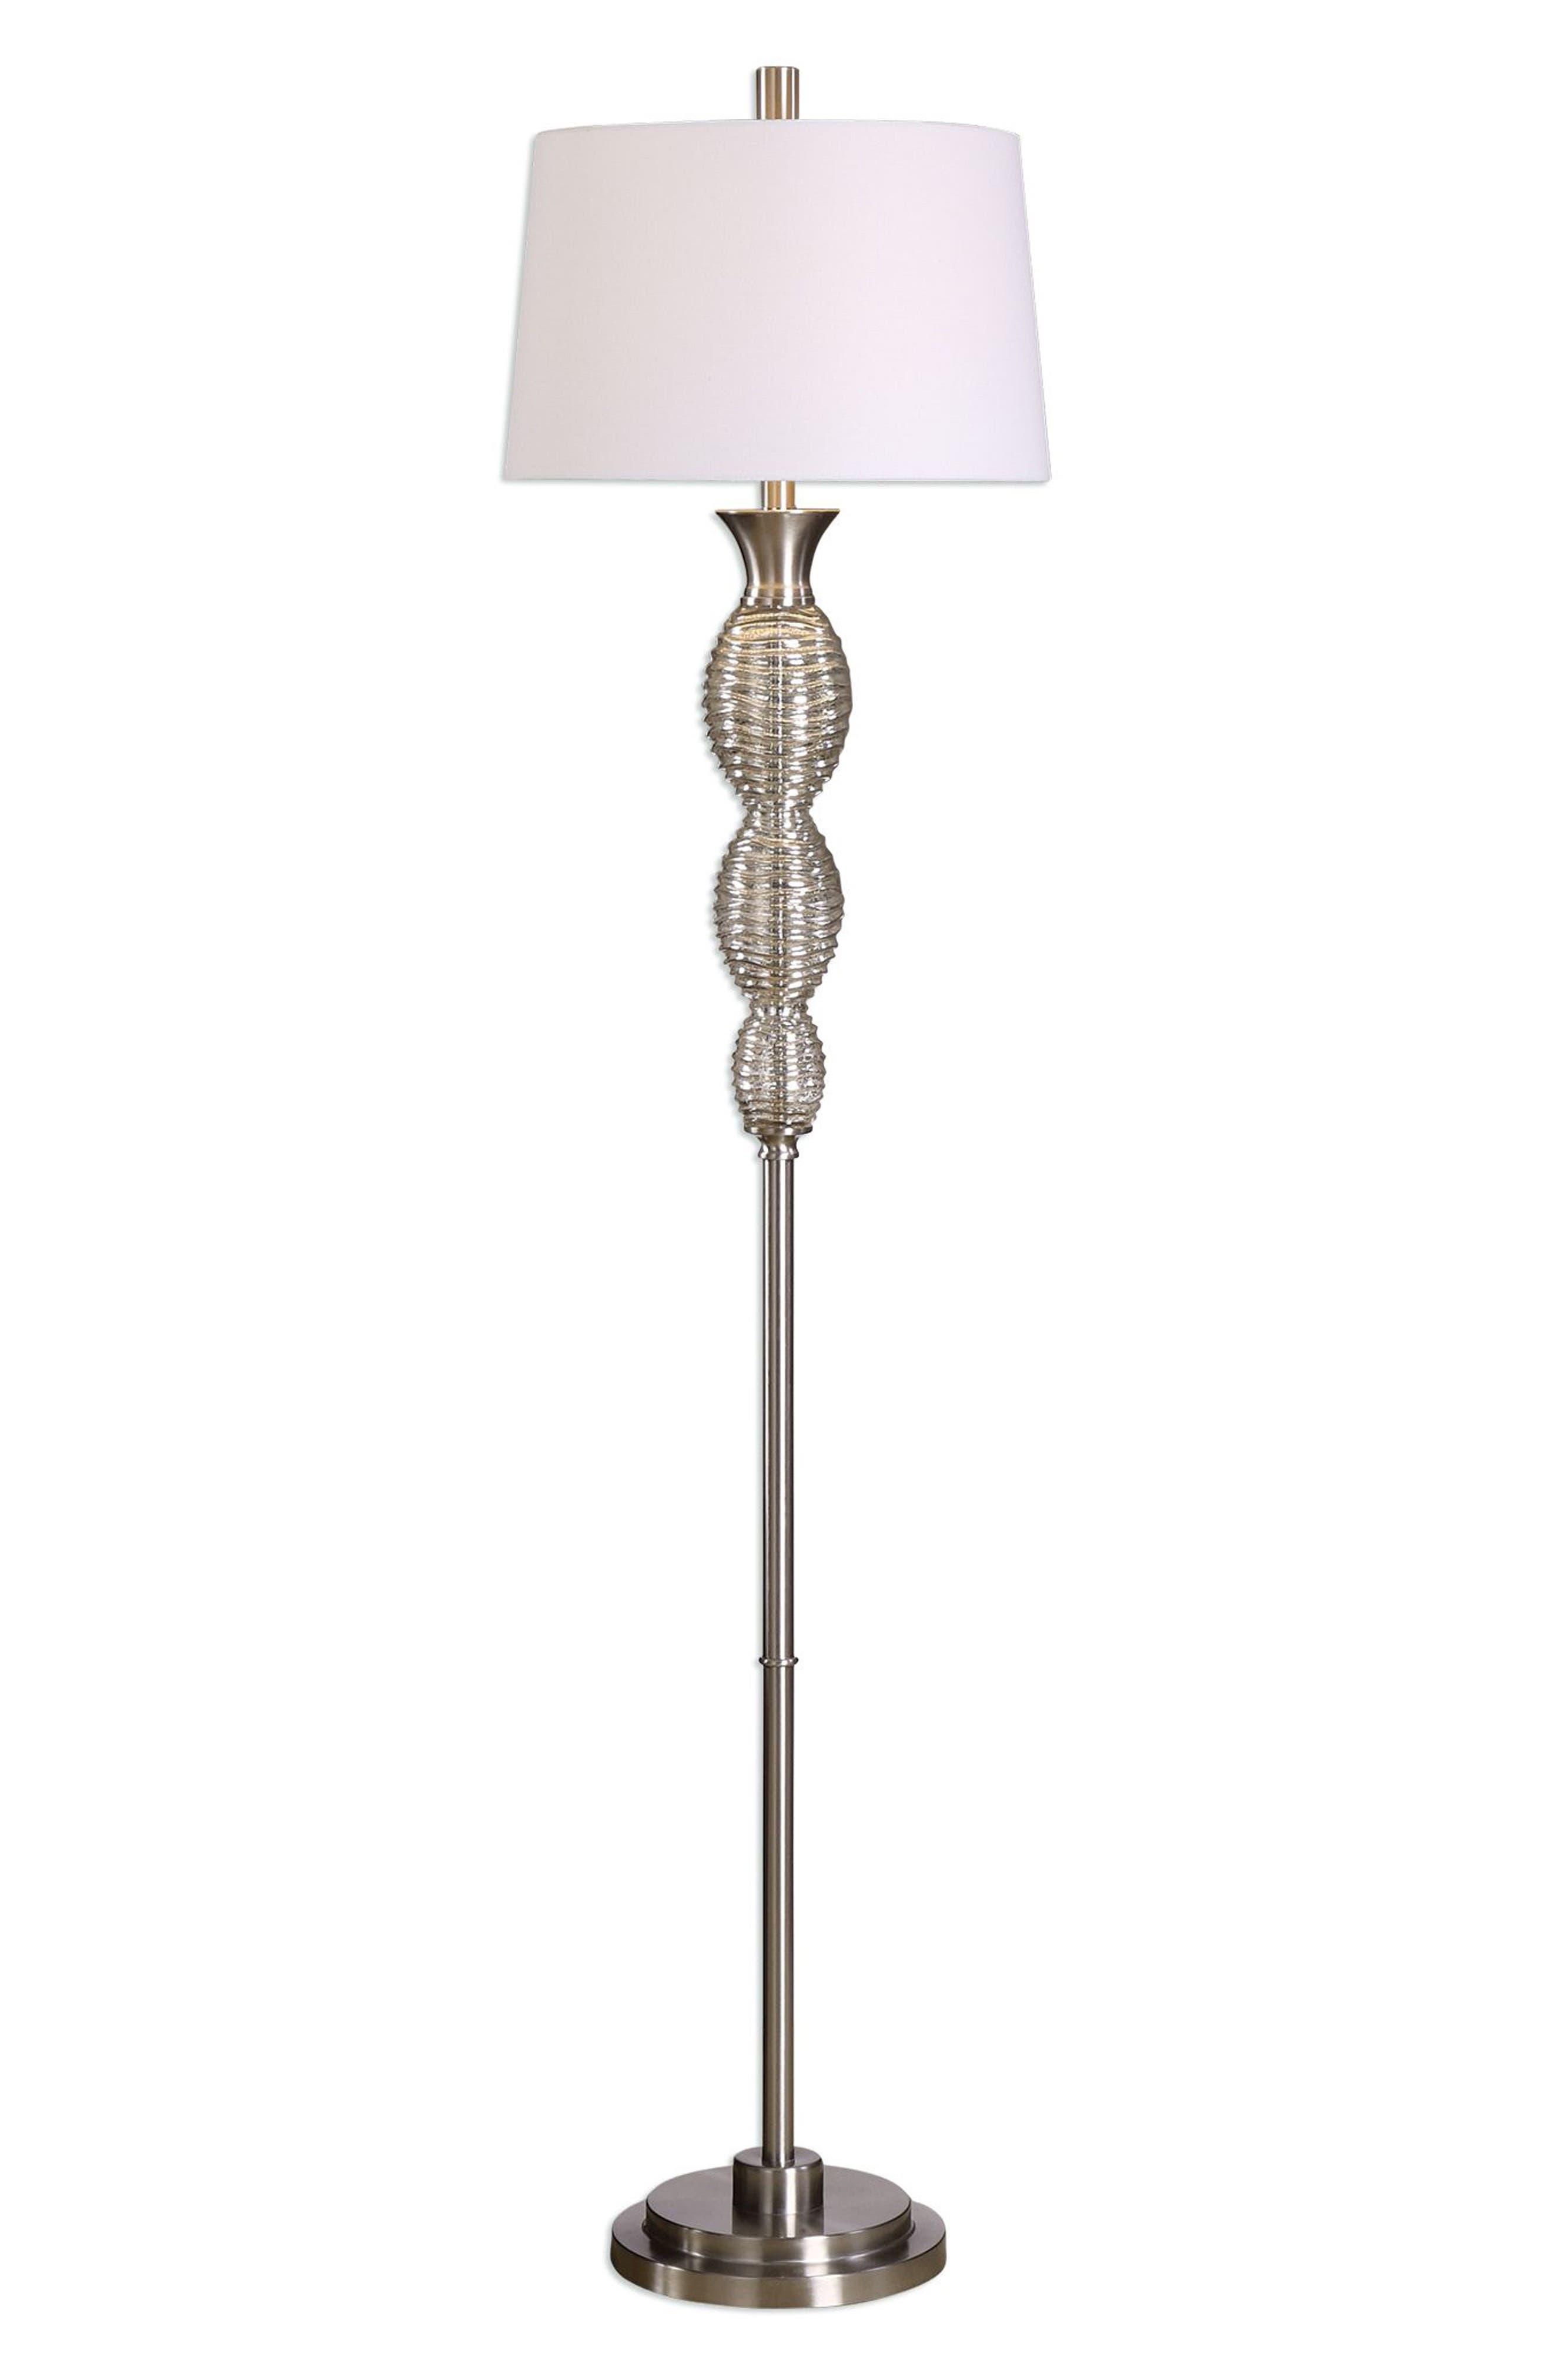 Mercury Glass Floor Lamp,                             Main thumbnail 1, color,                             040